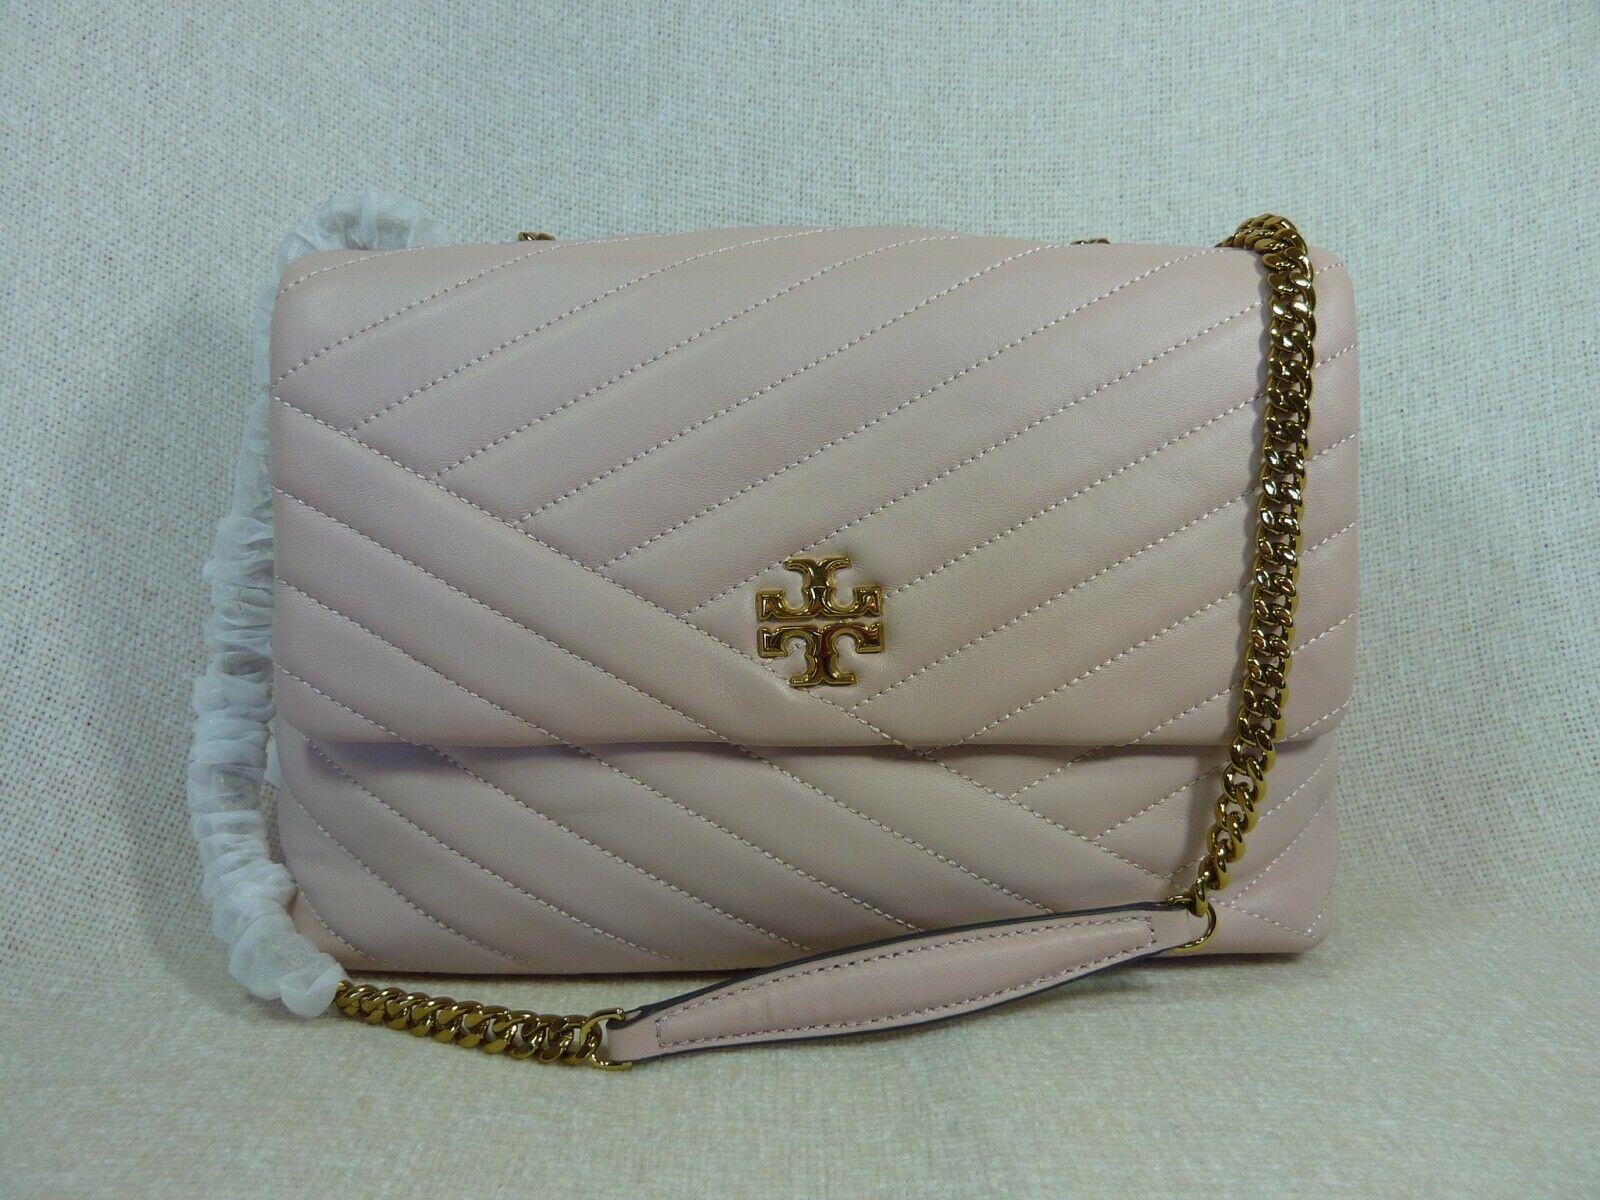 NWT Tory Burch Pink Moon Kira Chevron Convertible Shoulder Bag $528 image 4